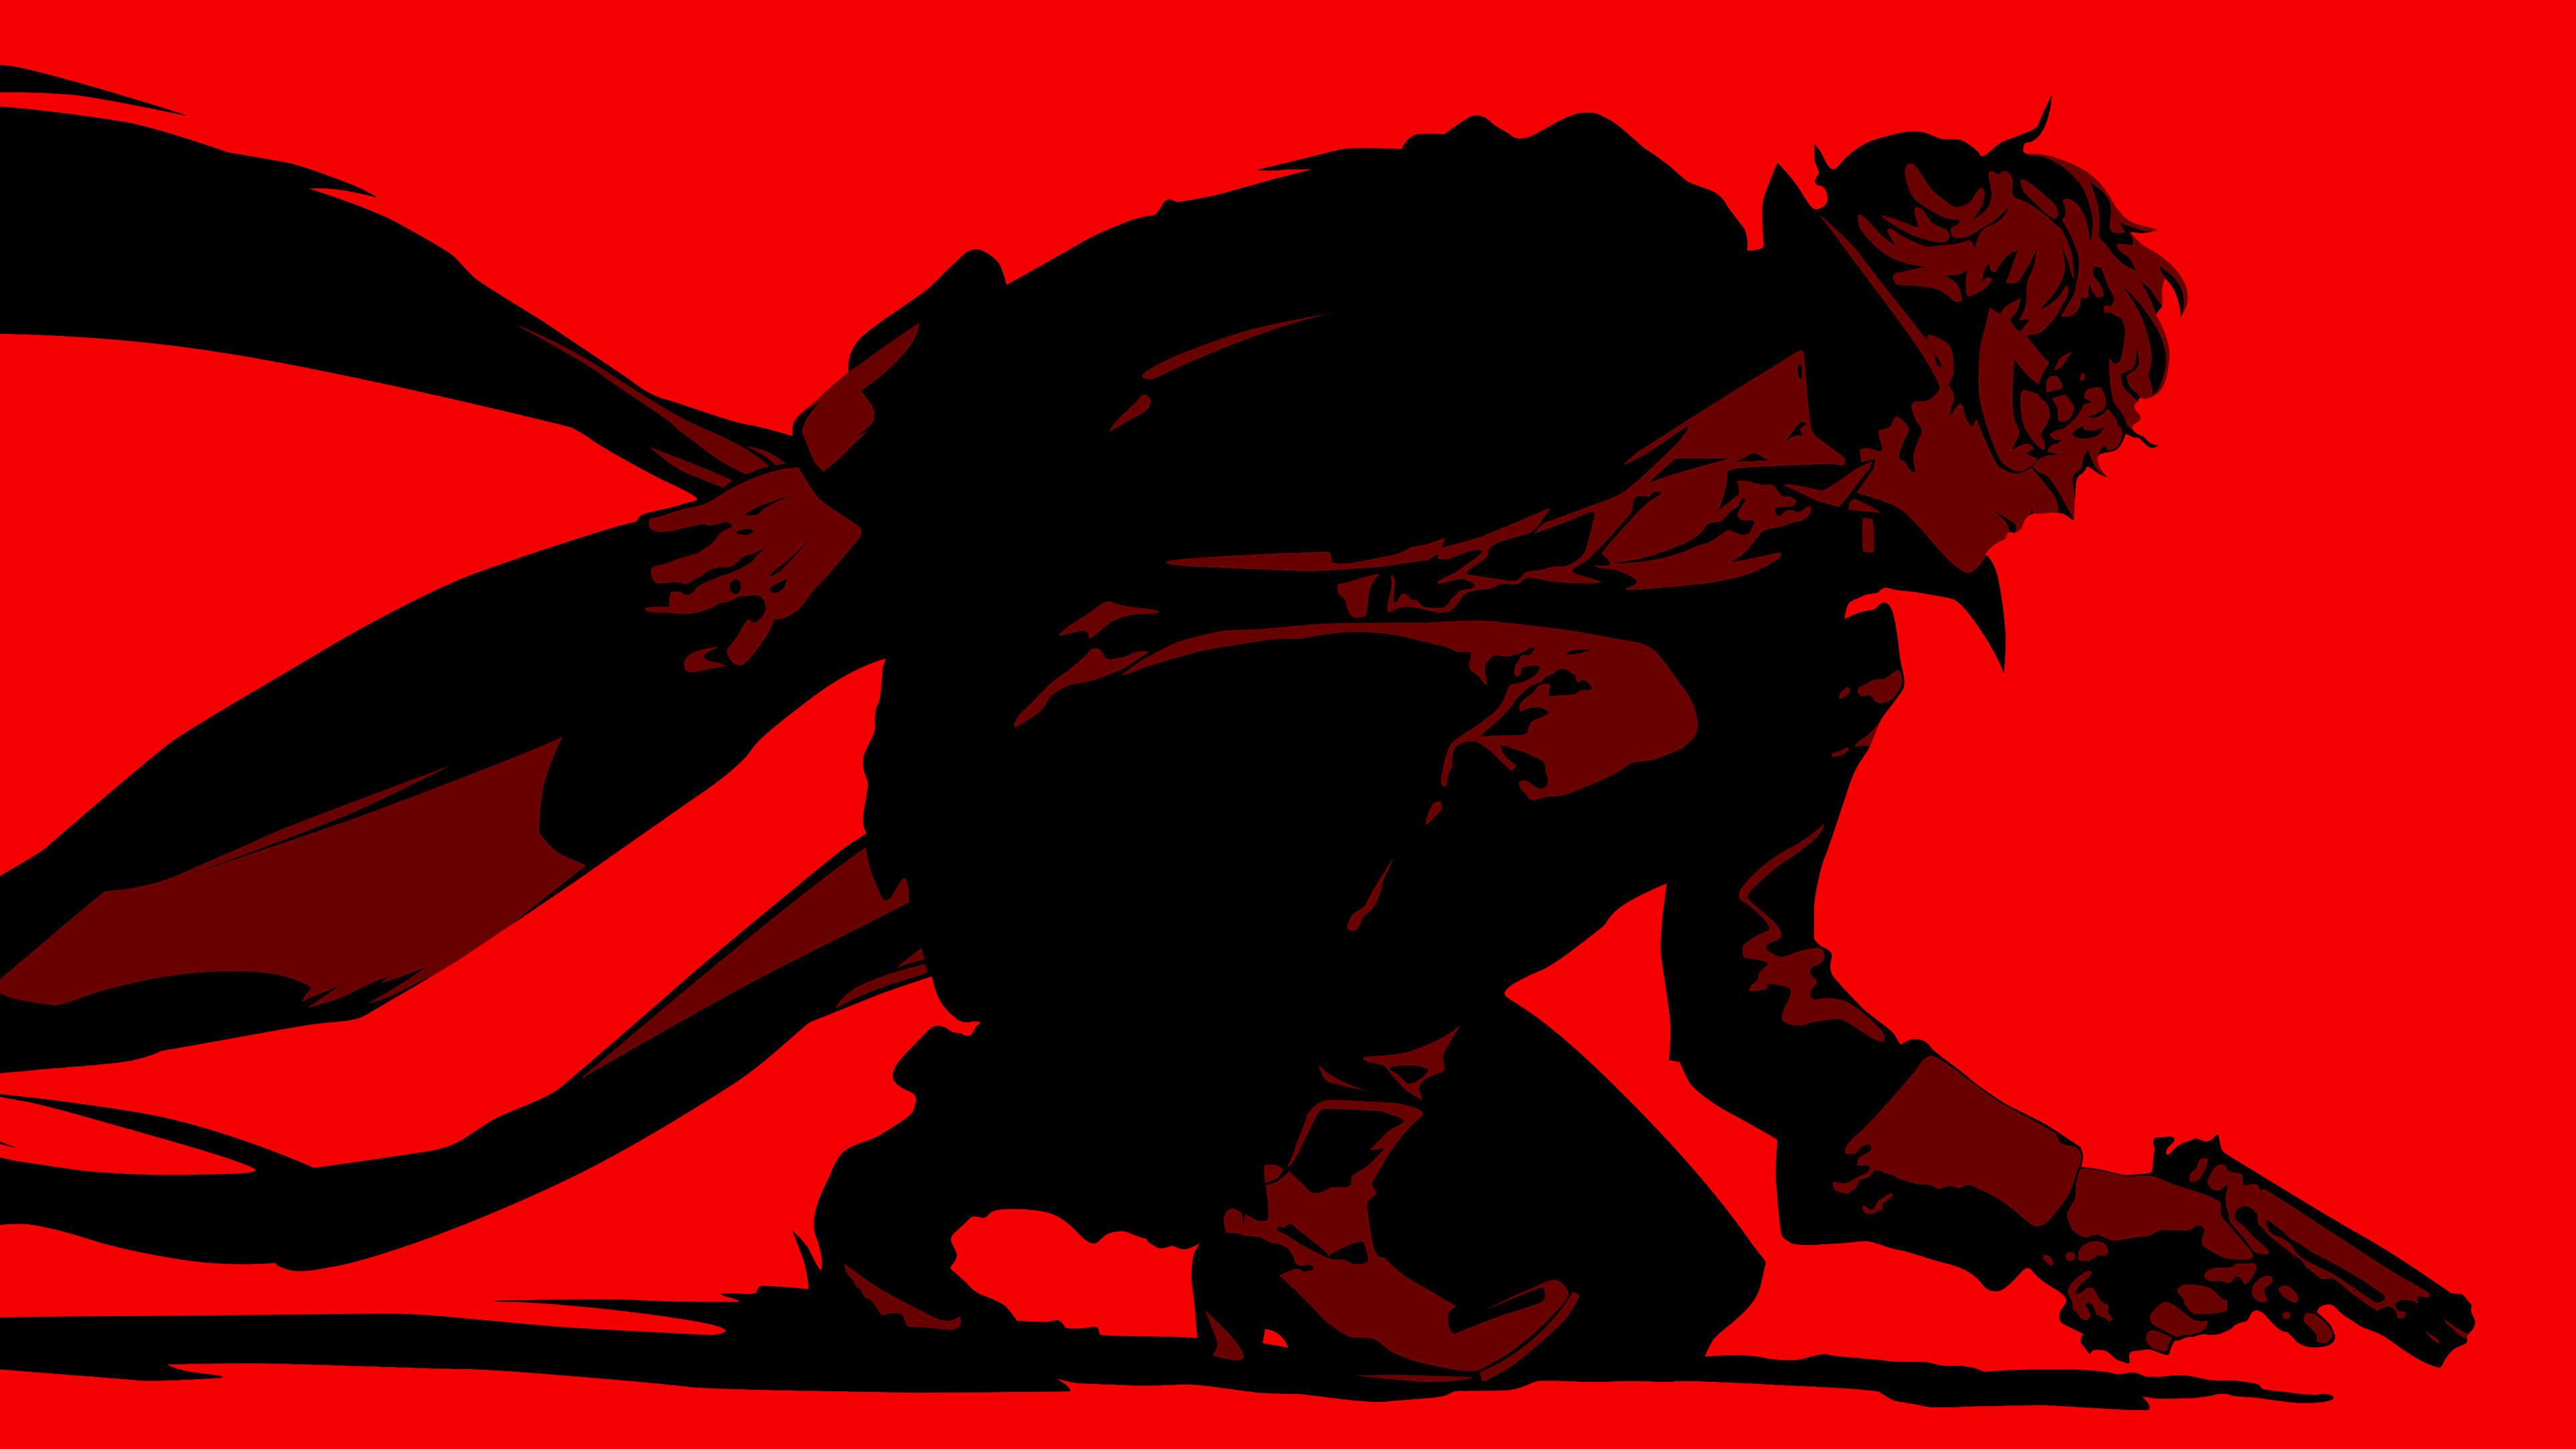 Persona 5 Wallpaper Hd 81 Images